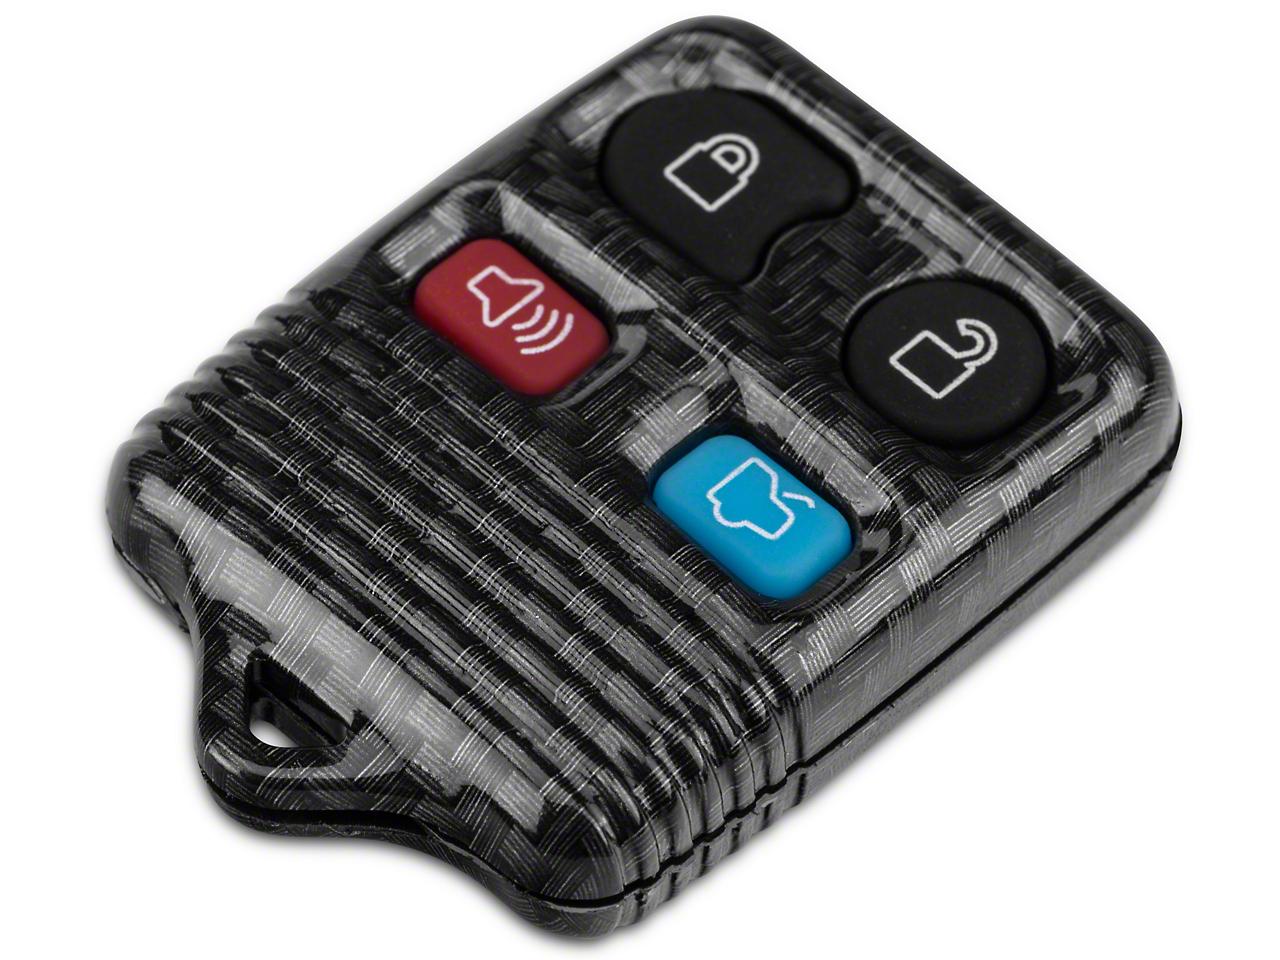 OPR Carbon Fiber Keyless Entry Remote Case w/ Key Pad (99-09 All)